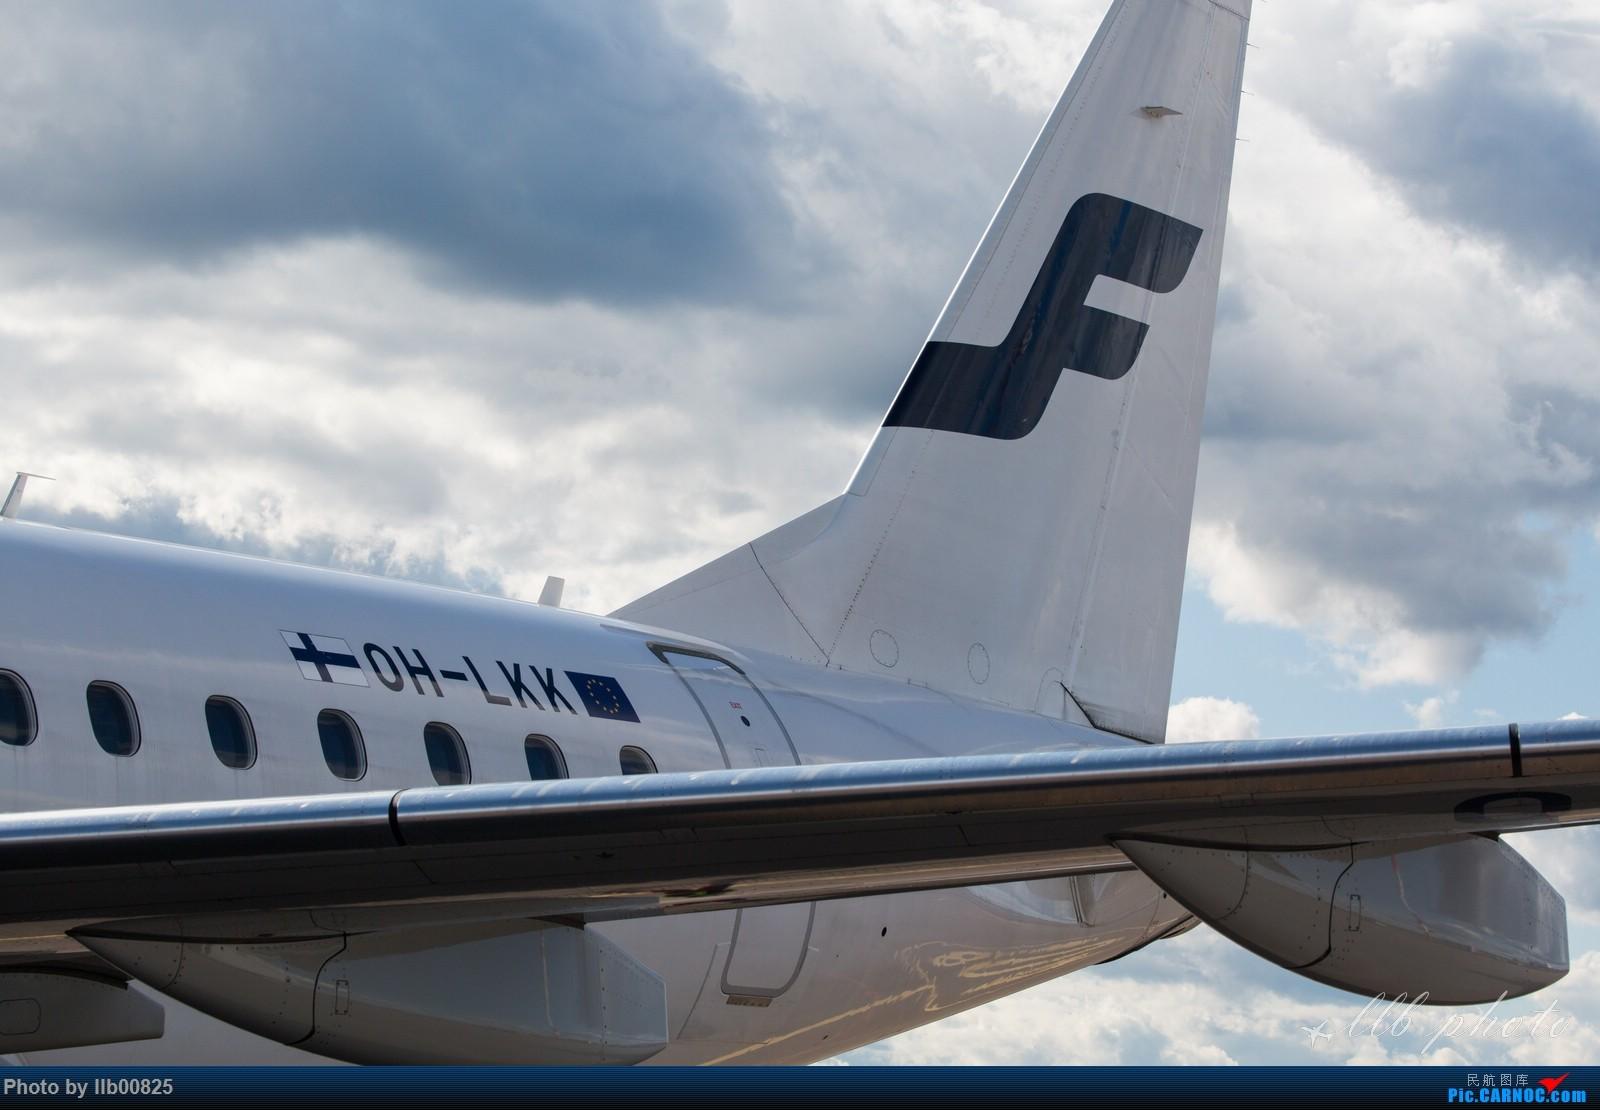 Re:[原创]赫尔辛基-布鲁塞尔一些杂图 EMBRAER E-190 OH-LKK 芬兰赫尔辛基机场